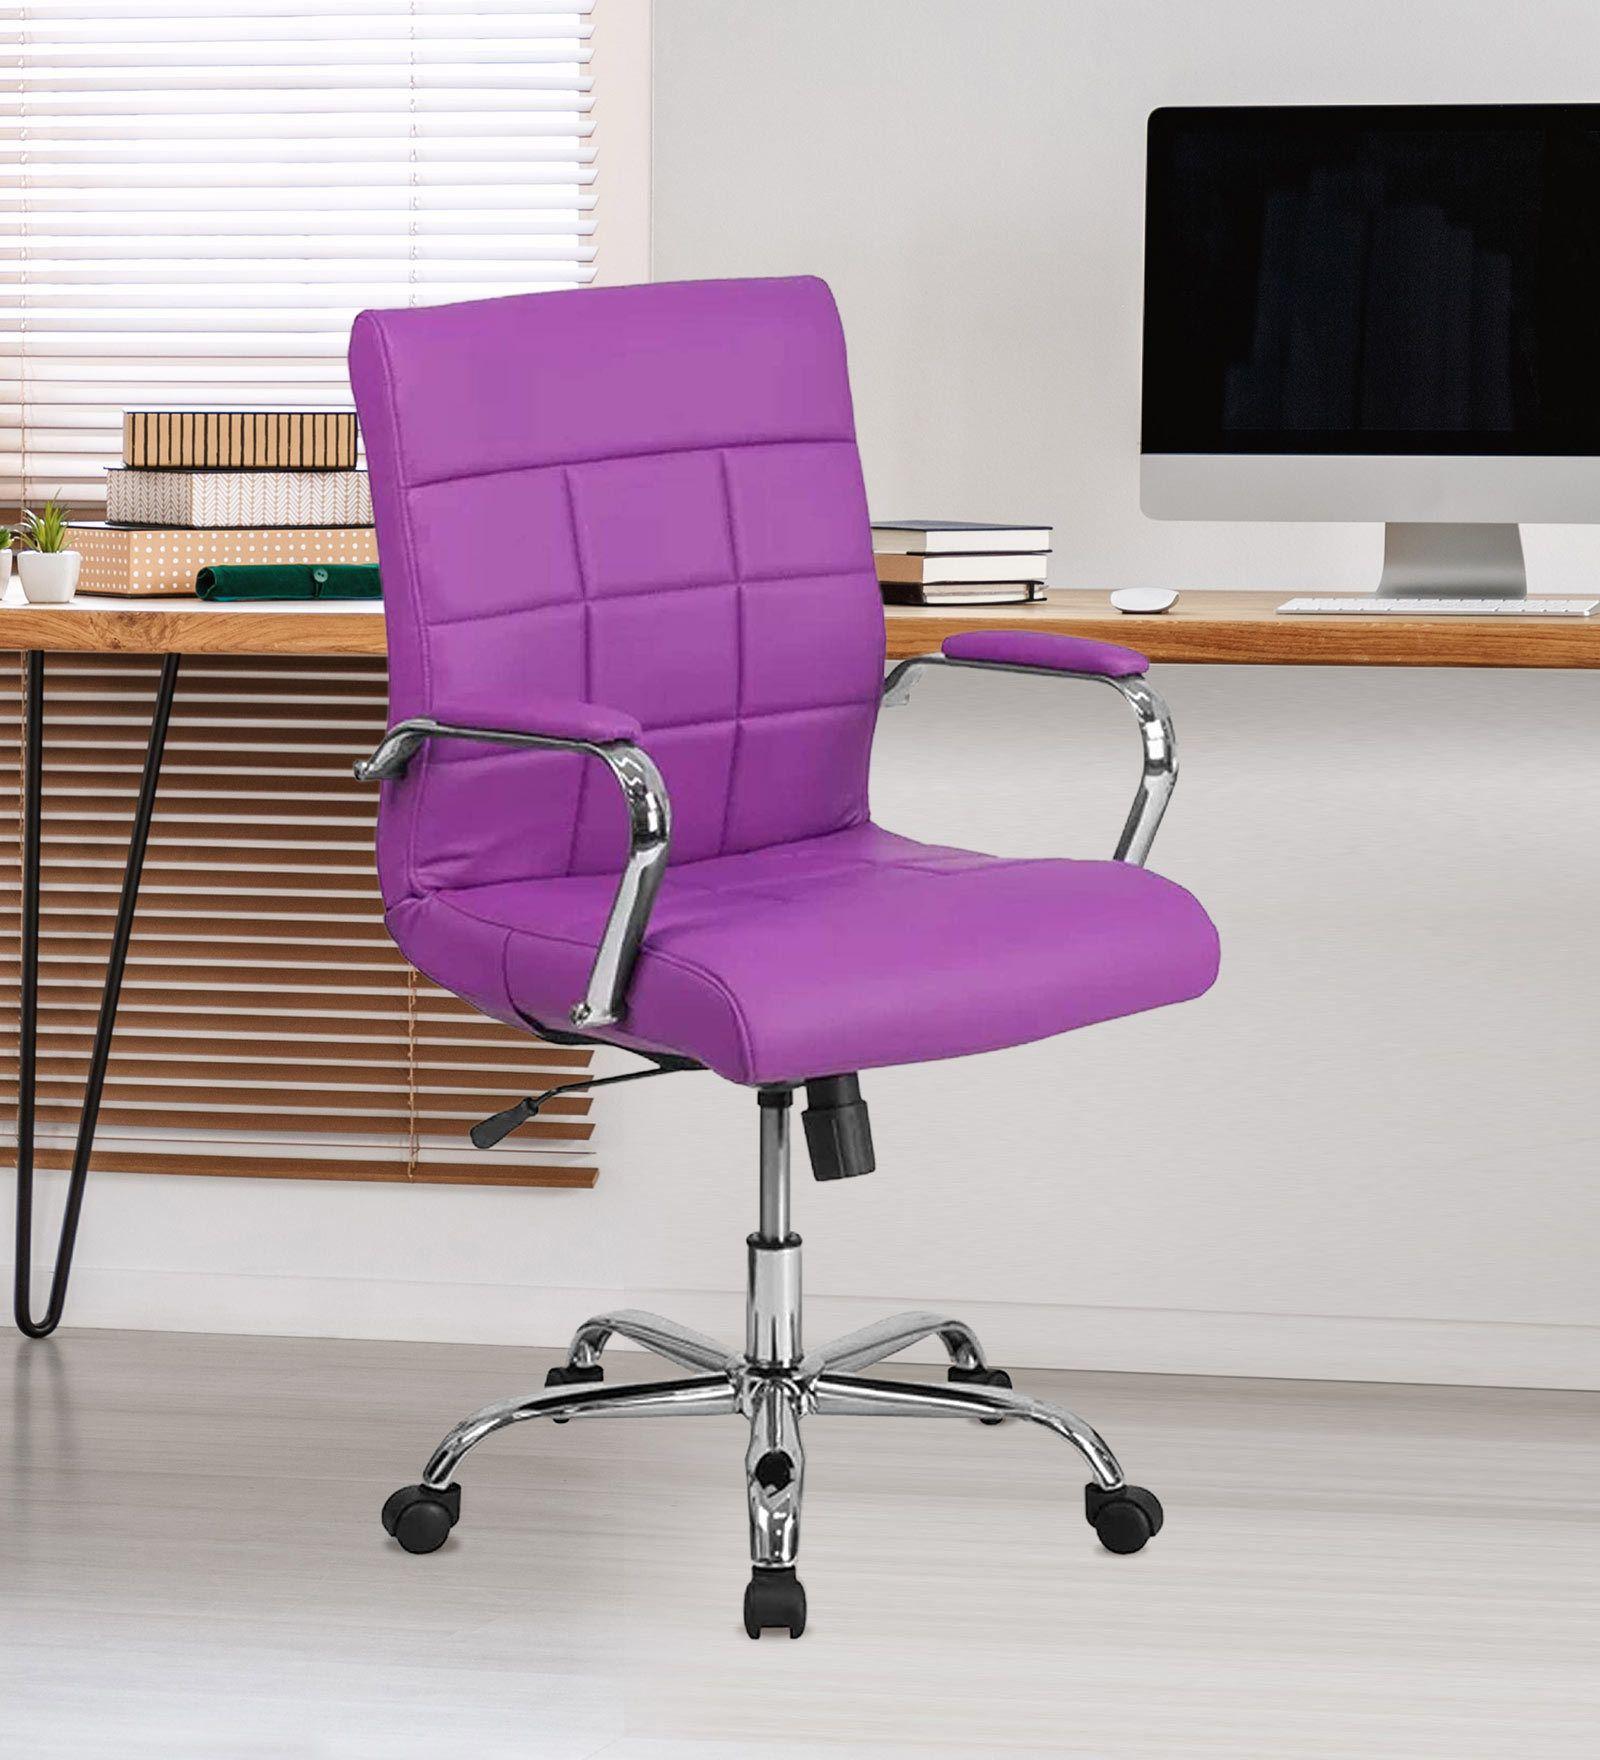 Eva Executive Office Chair Purple Colour By Furniturstation Executive Office Chairs Office Chair Ergonomic Chair